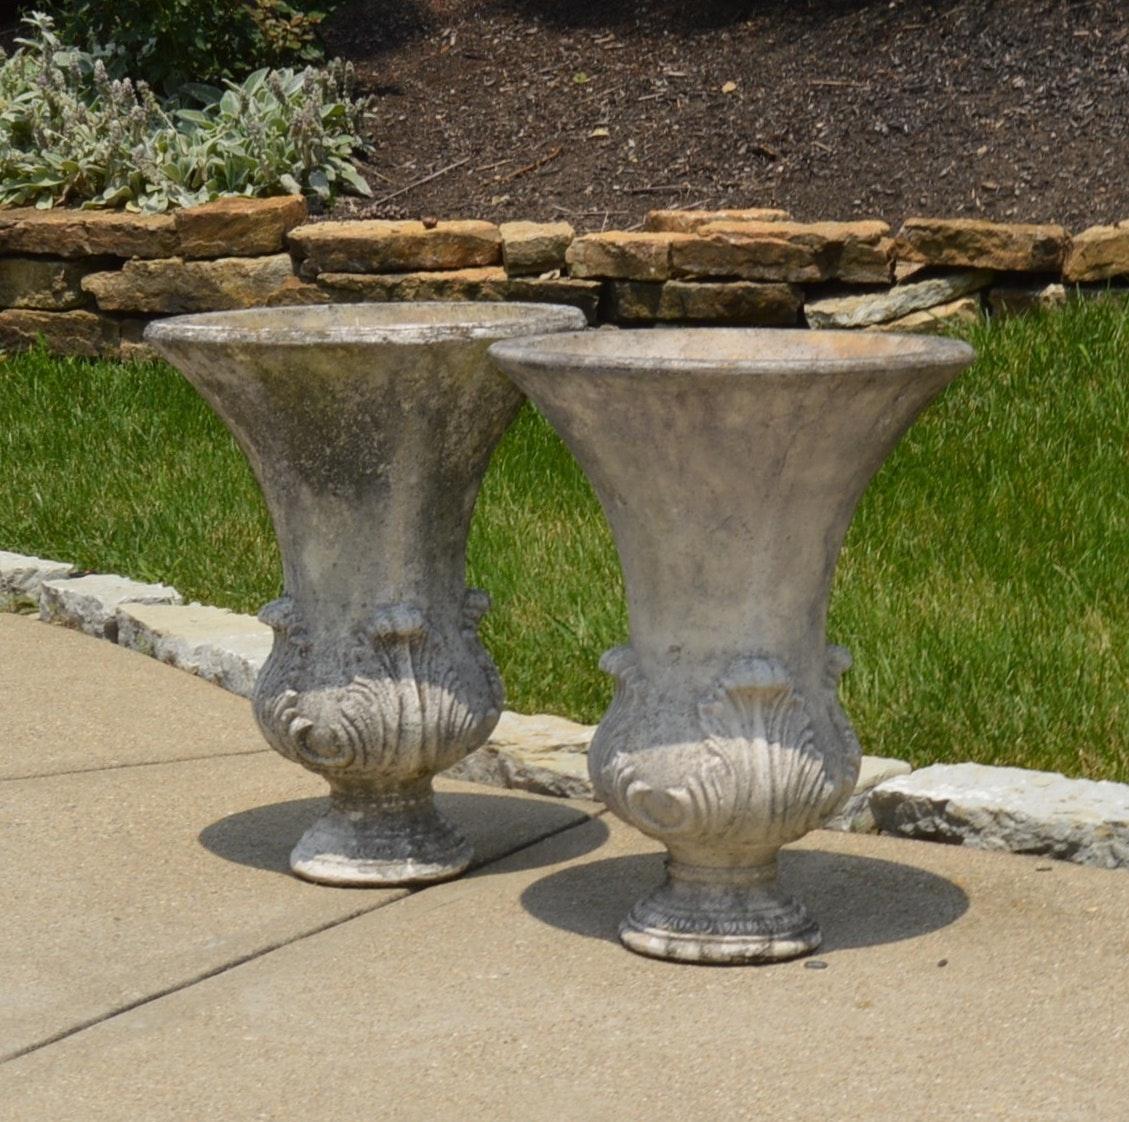 Pair of Lightweight Fiberglass Urn Planters